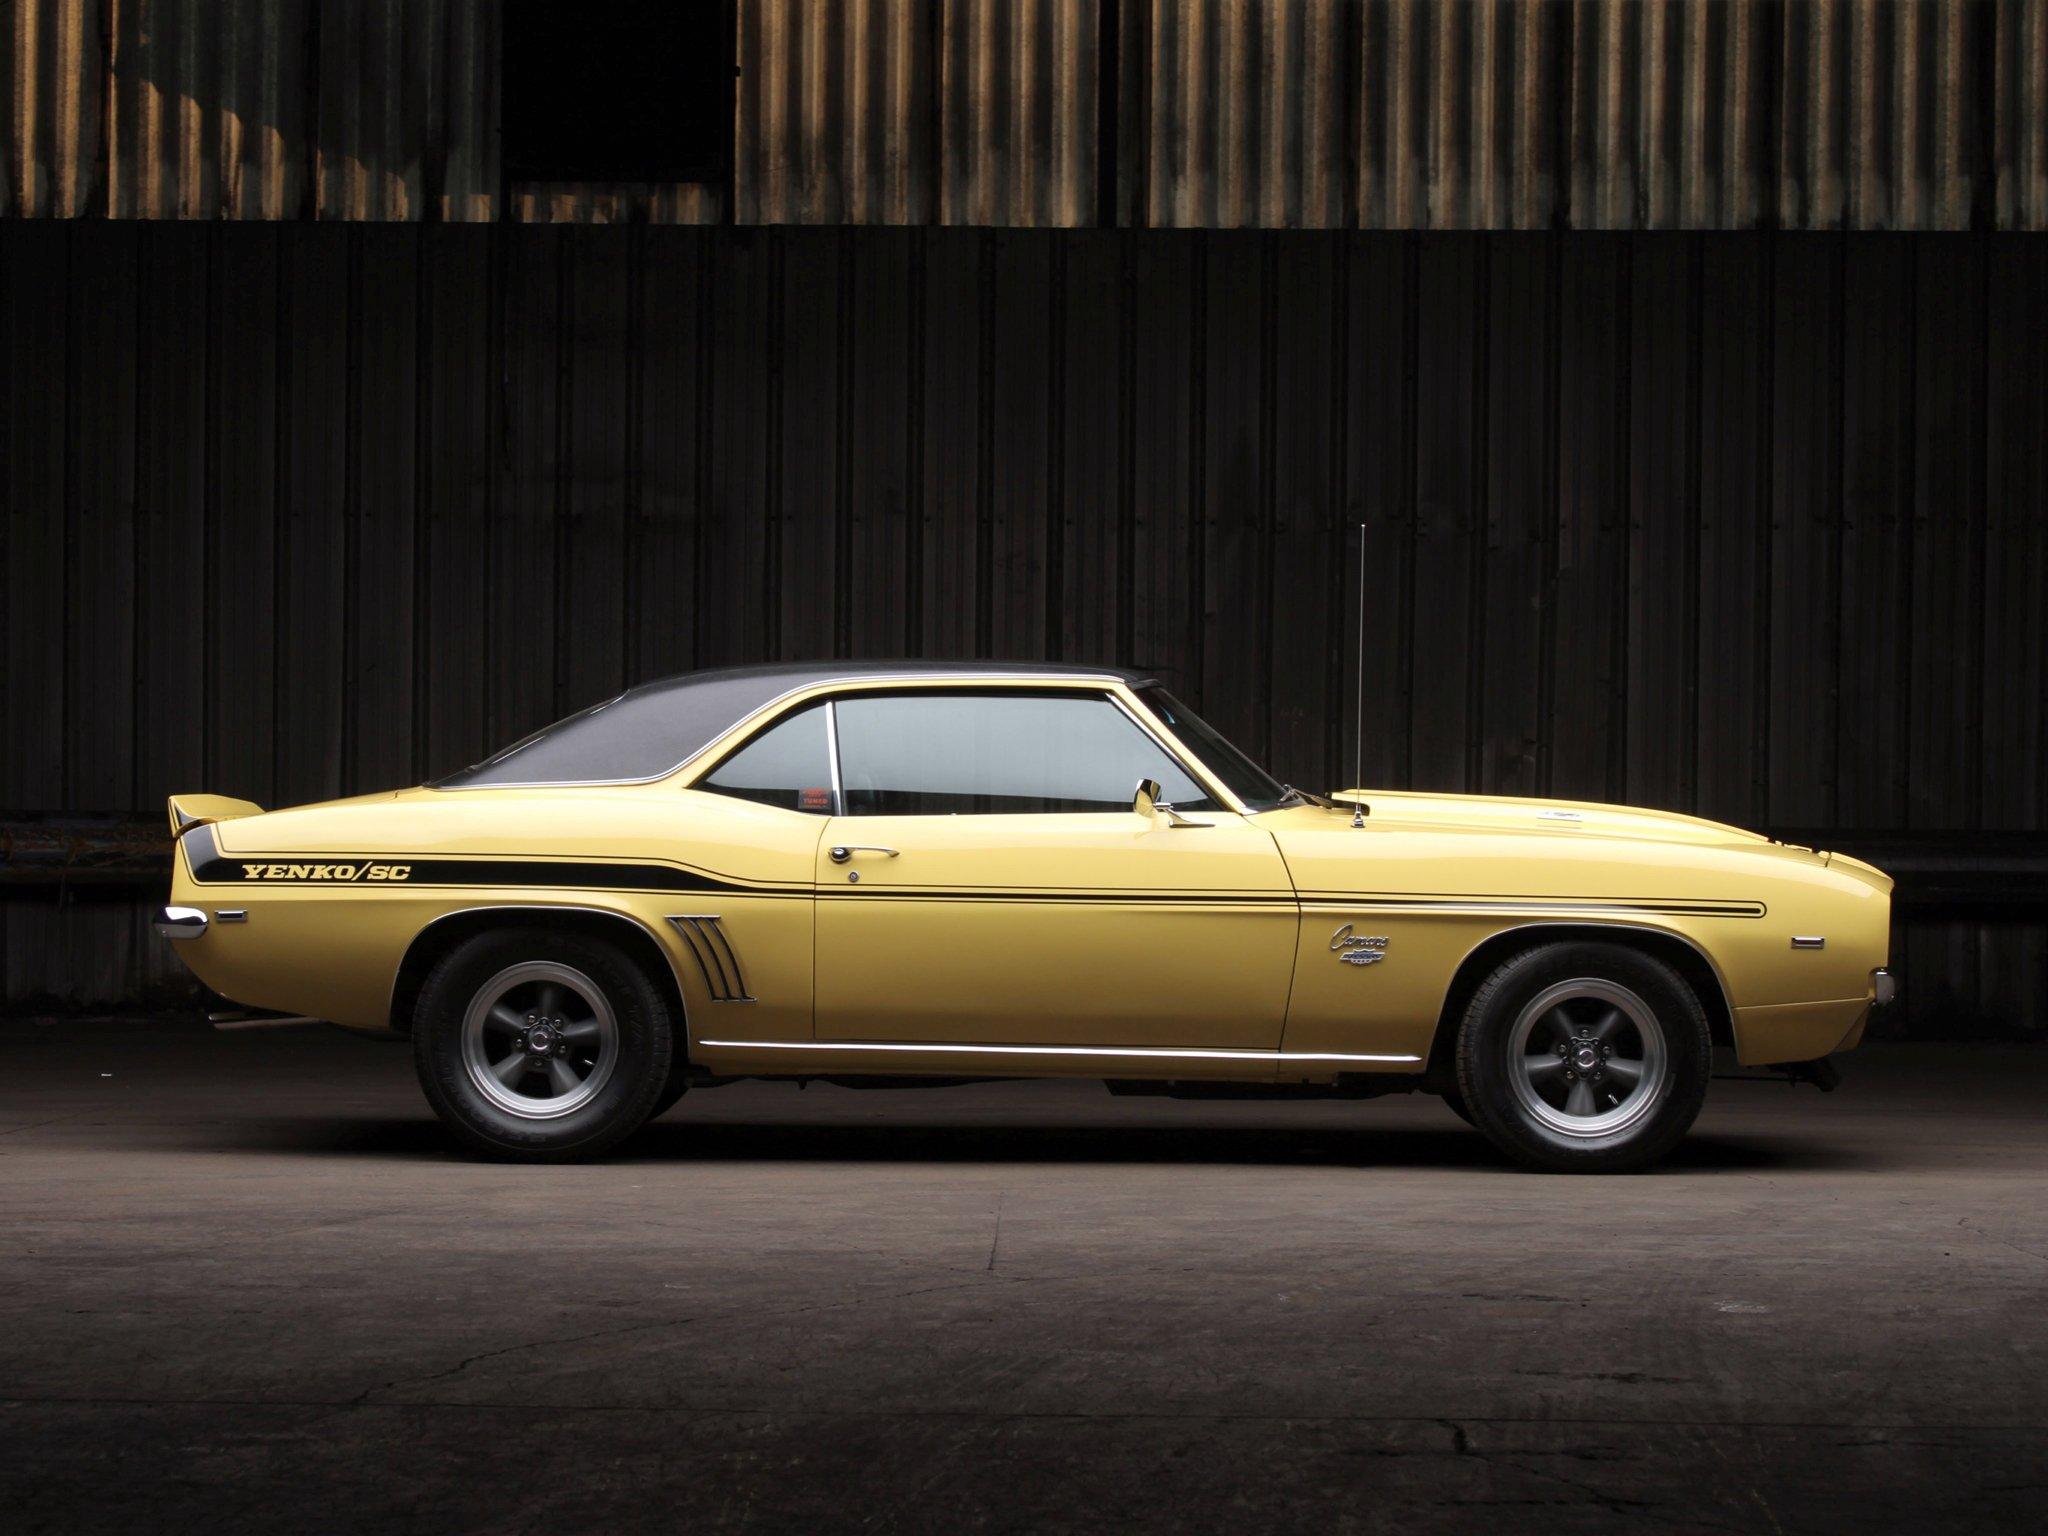 1969 Chevrolet Camaro Yenko S C 427 Muscle Classic G Wallpaper 1968 2048x1536 270386 Wallpaperup